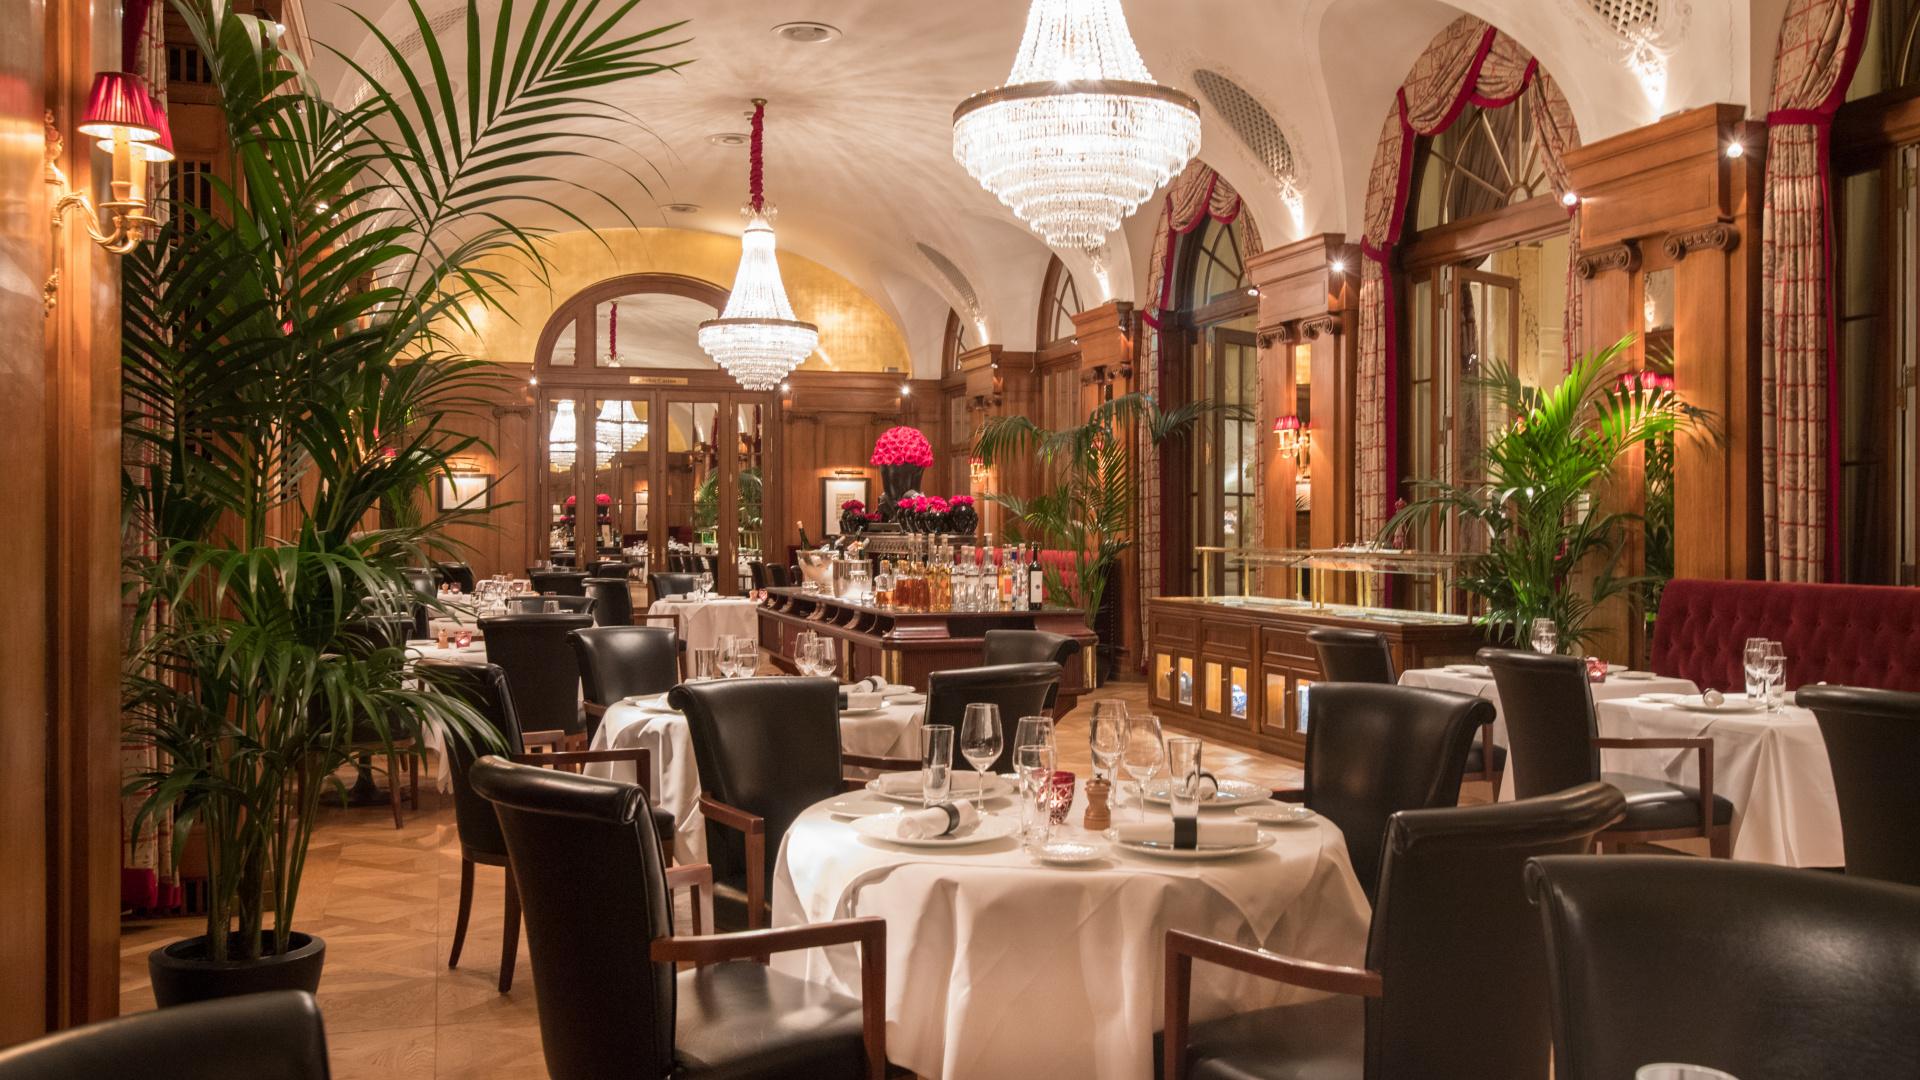 Restaurant VUE Bern Tourism